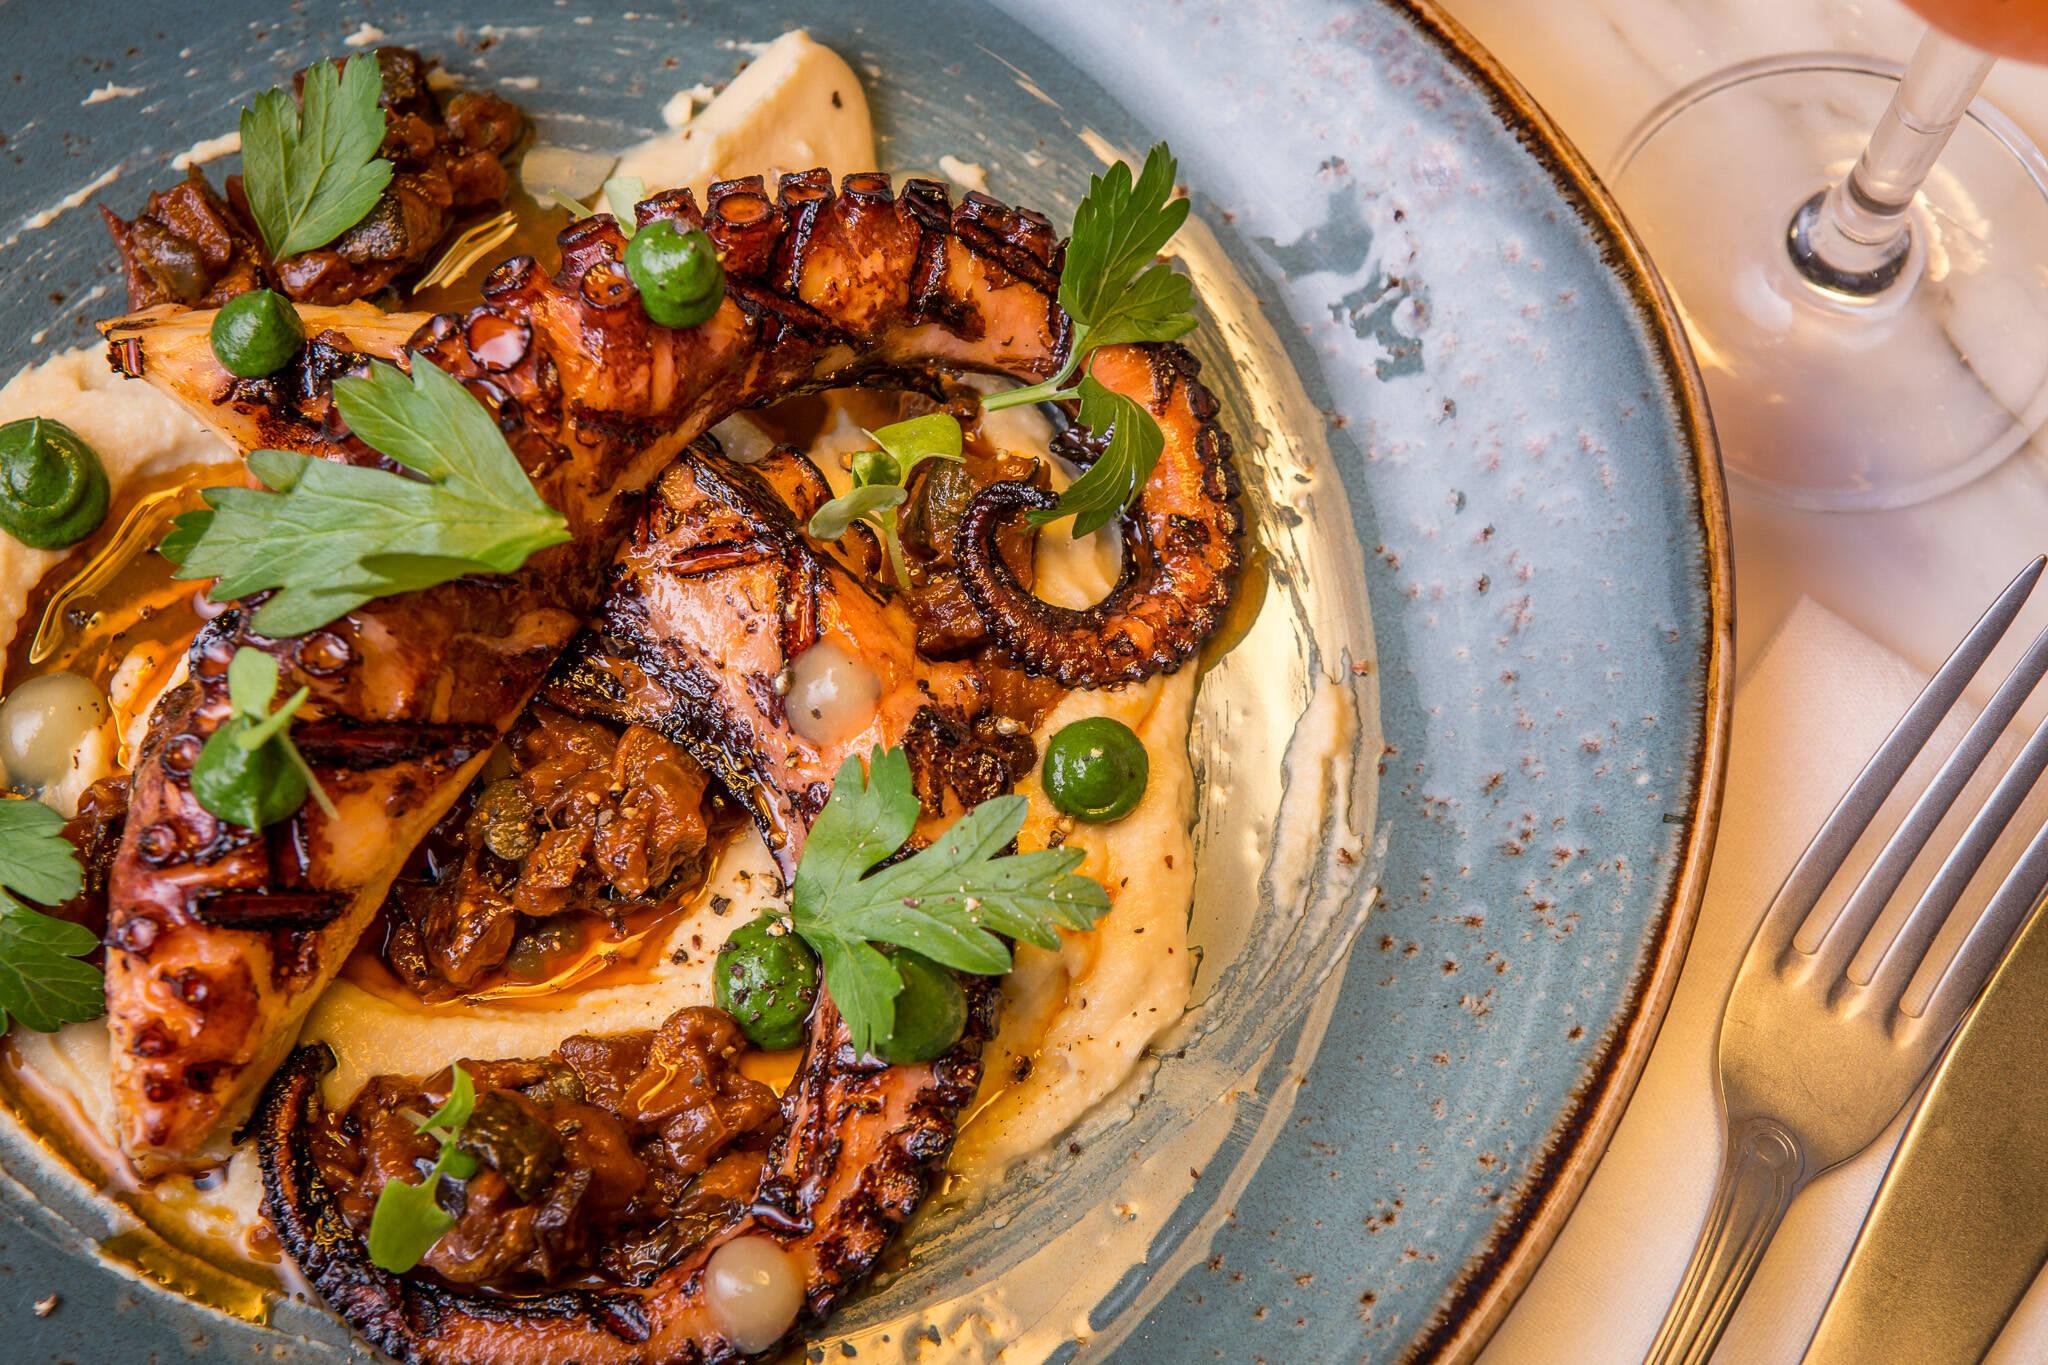 Ufficio Discount : 20 restaurants to eat at during winterlicious 2017